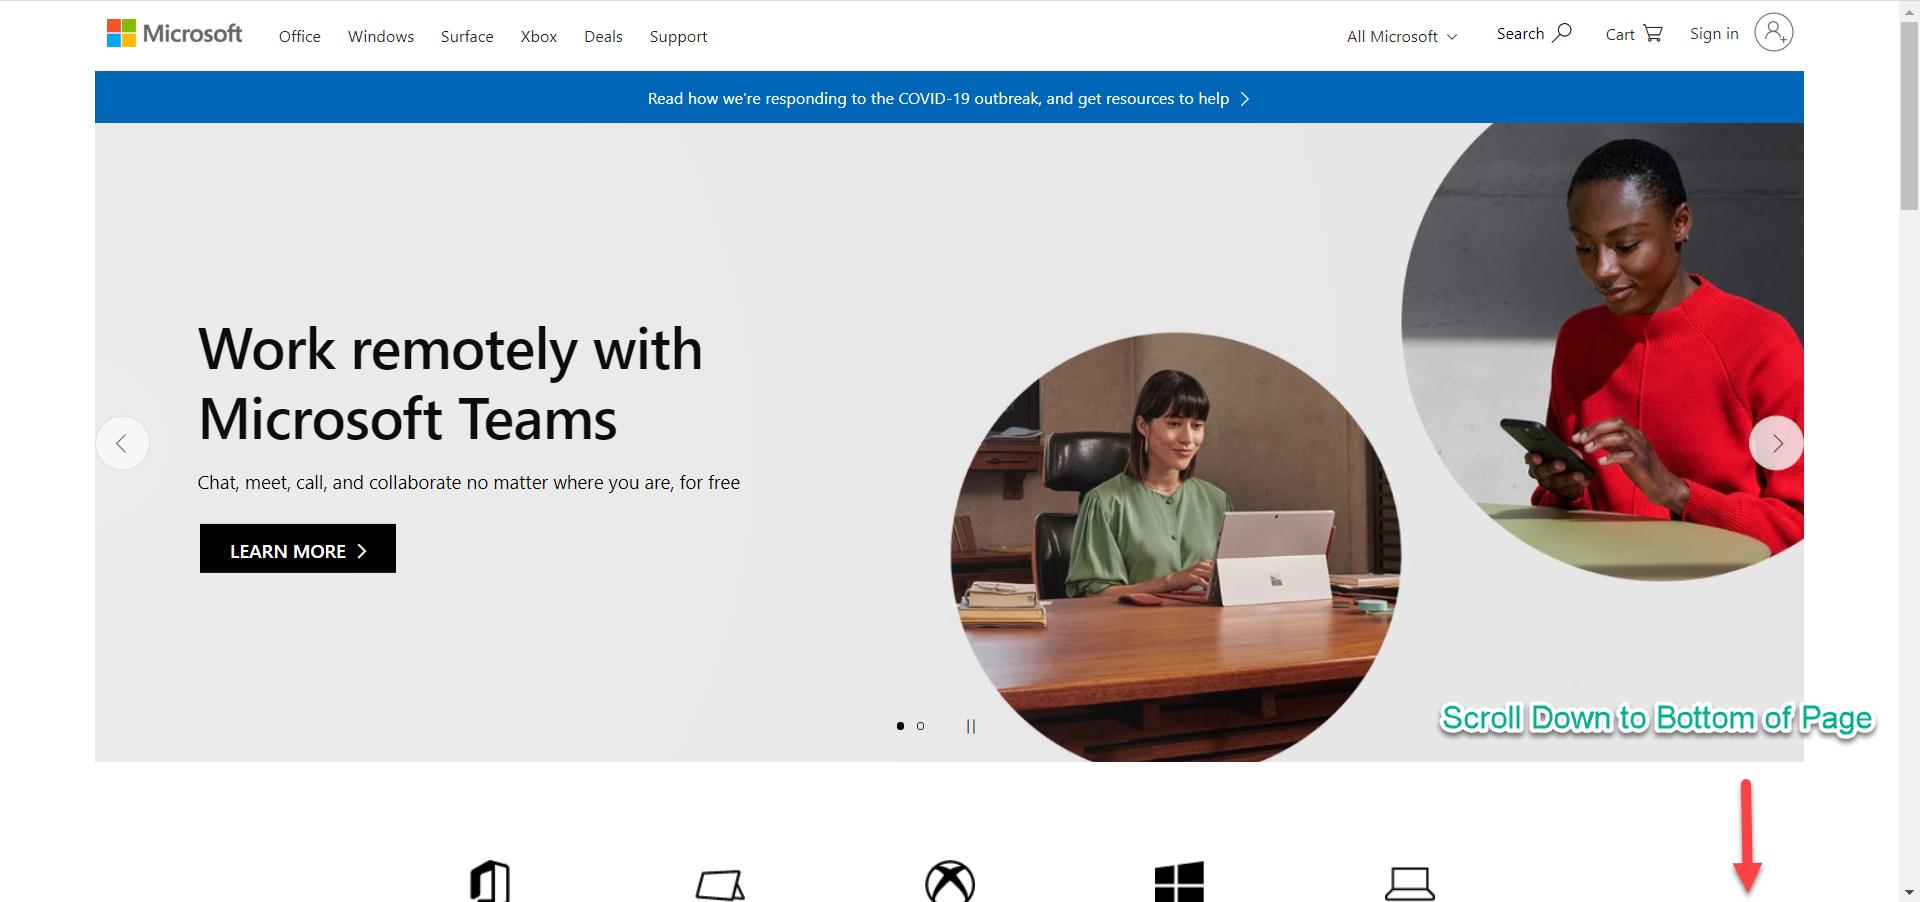 Microsoft's Main Page